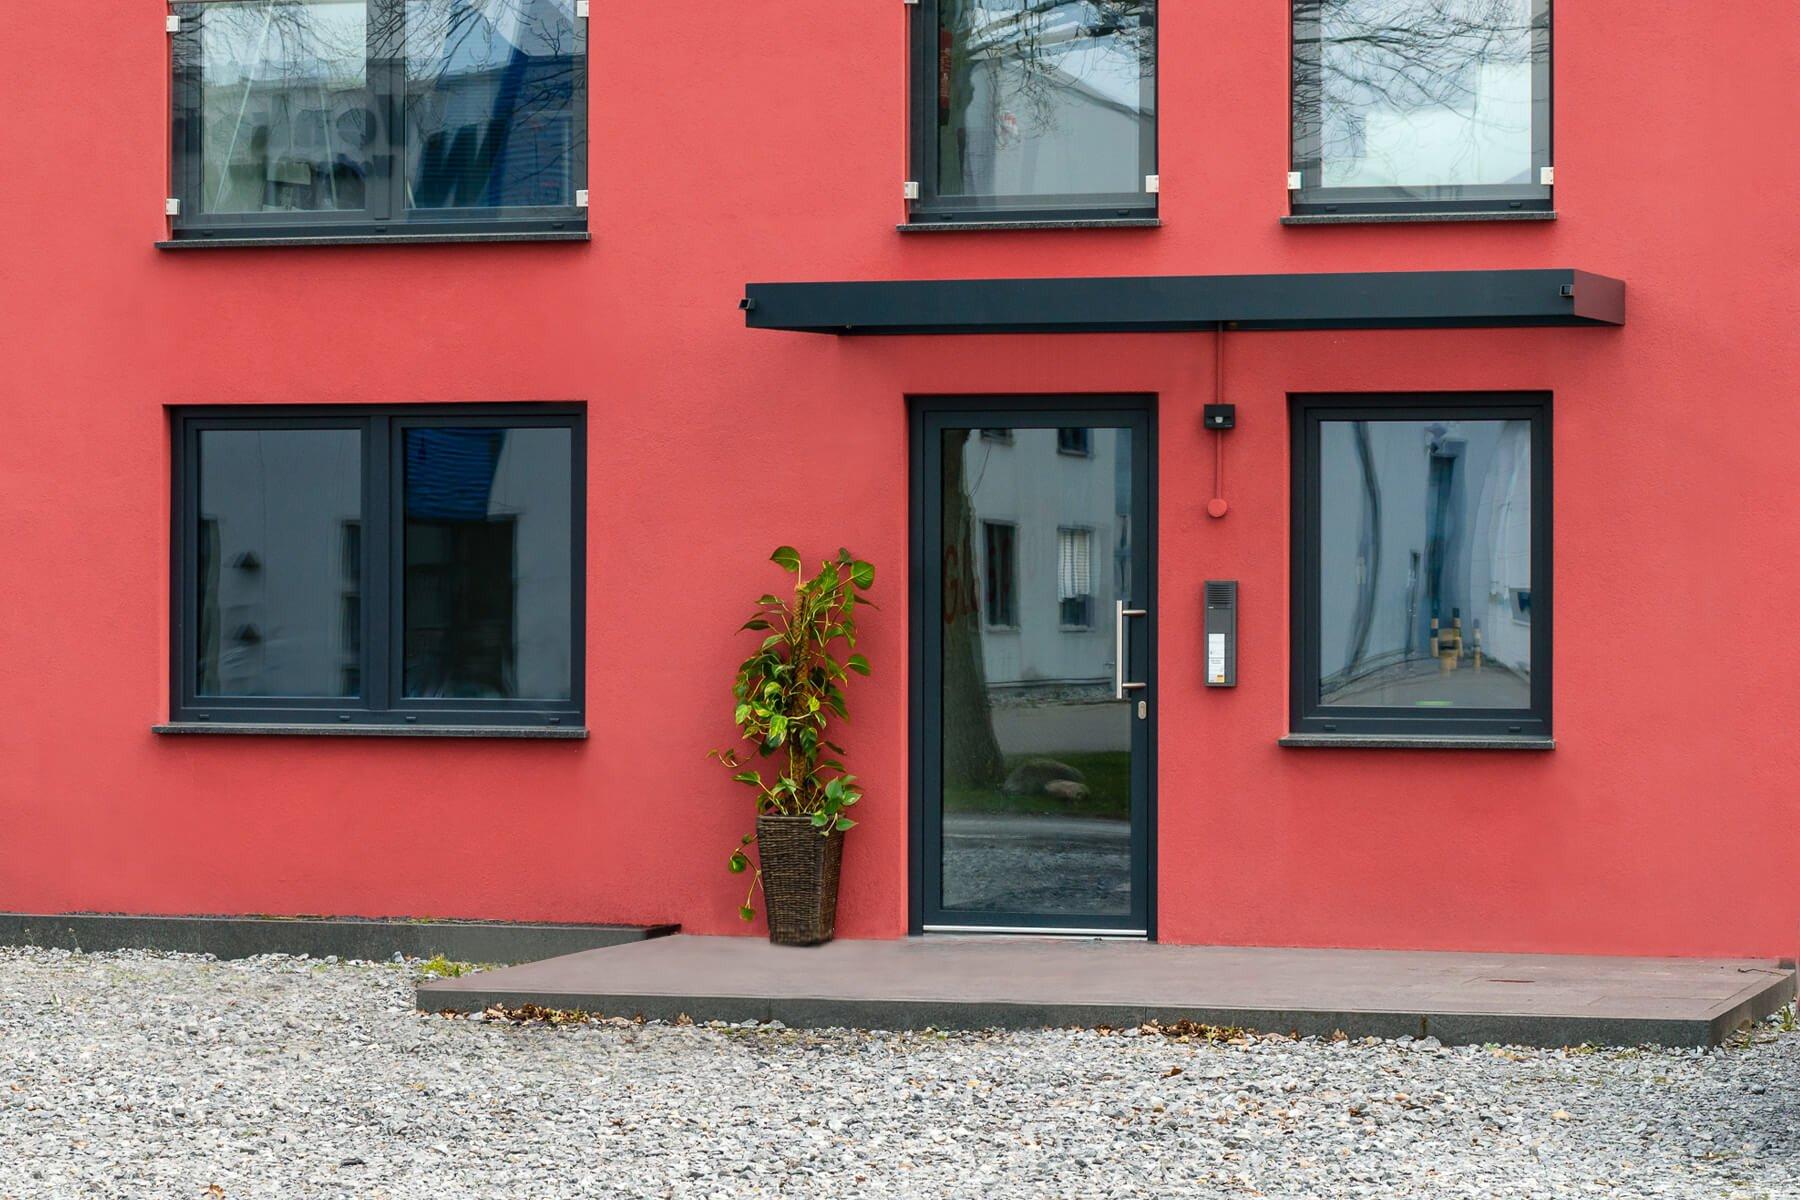 hochwertiges-vordach-an-roter-fassade